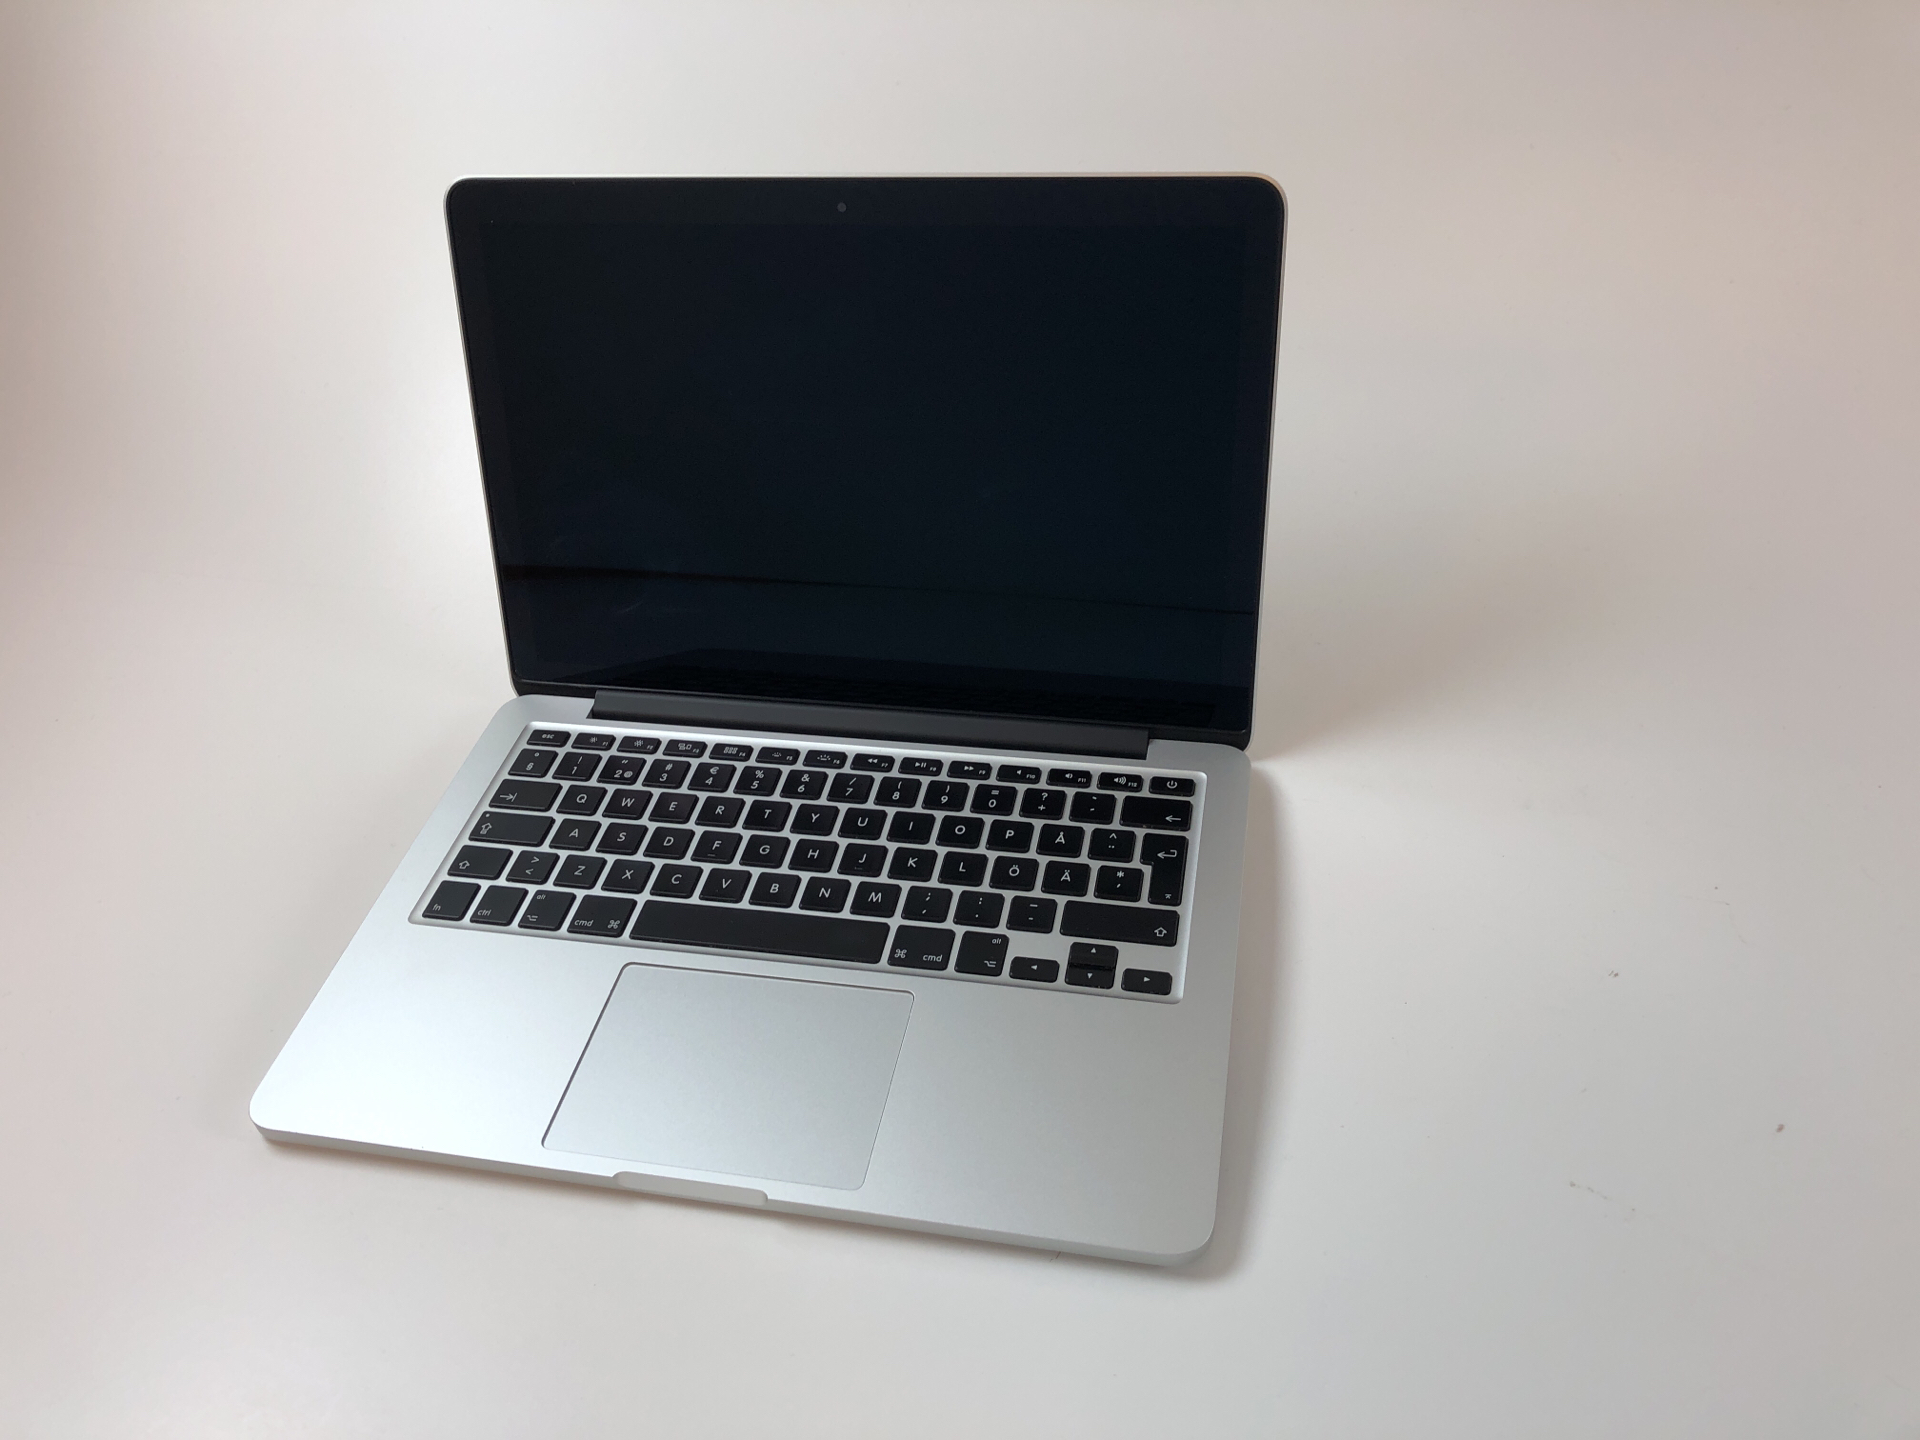 "MacBook Pro Retina 13"" Late 2013 (Intel Core i5 2.6 GHz 16 GB RAM 512 GB SSD), Intel Core i5 2.6 GHz, 16 GB RAM, 512 GB SSD, Kuva 1"